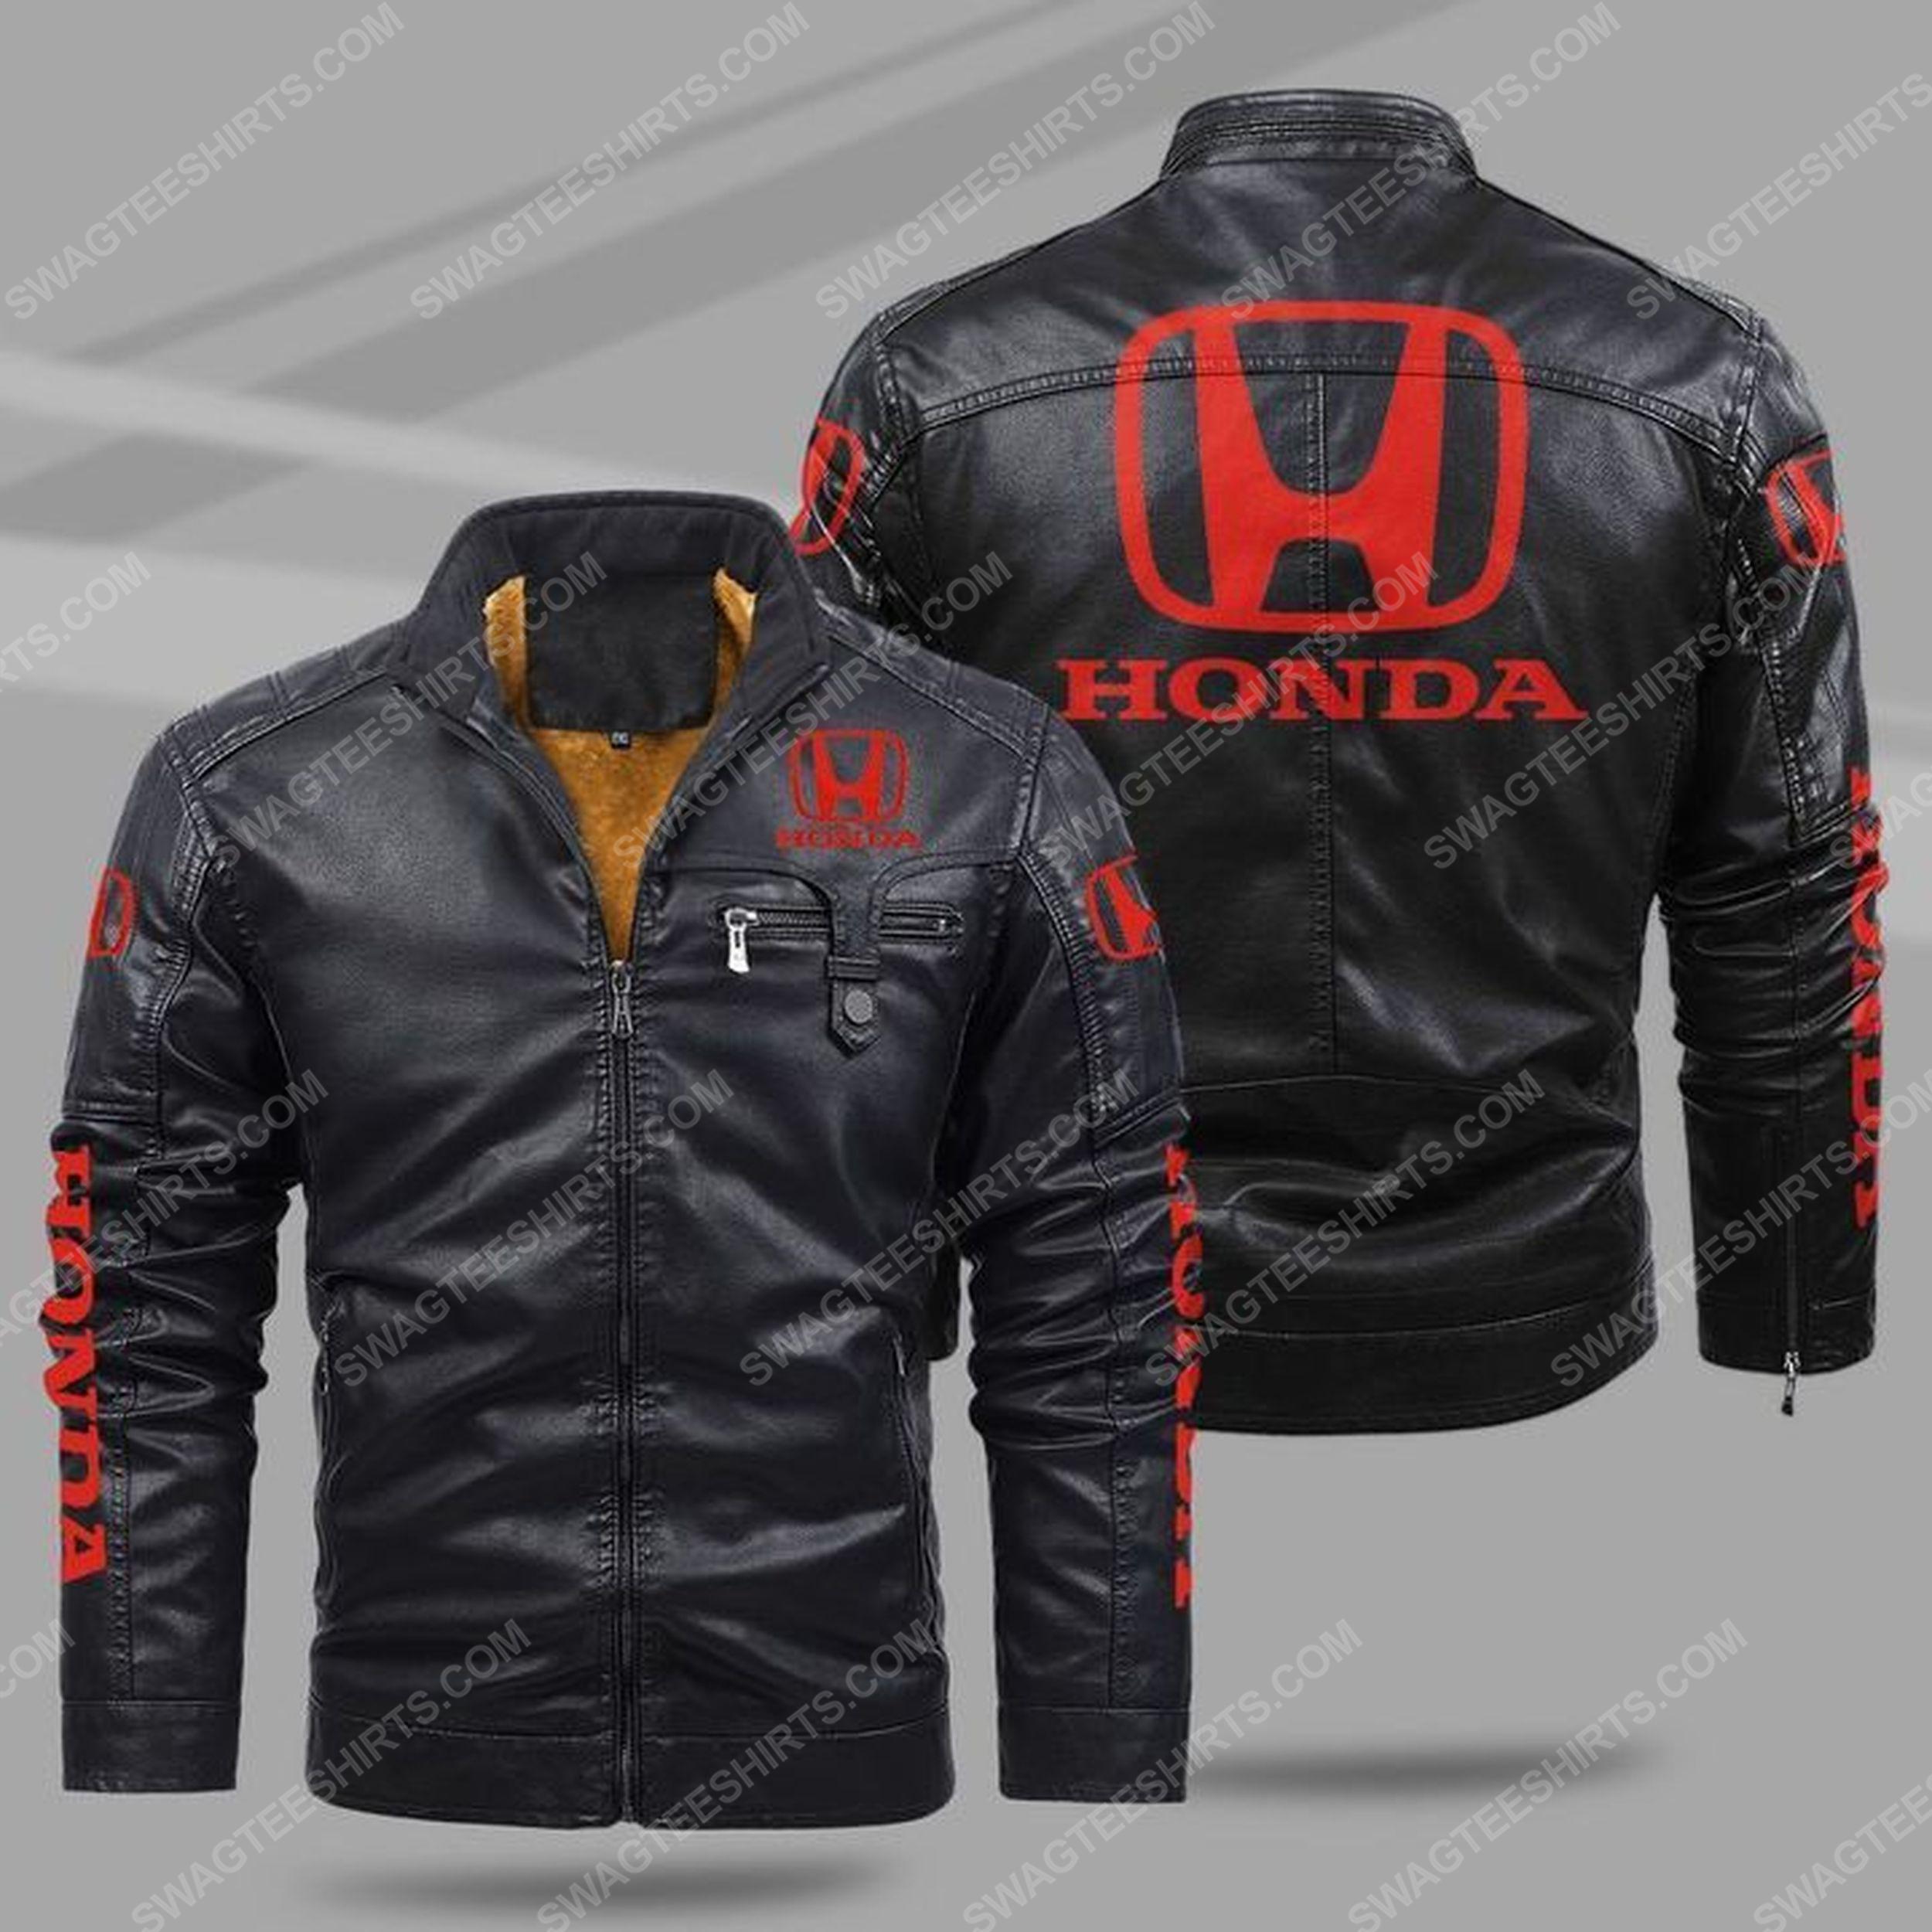 Honda car all over print fleece leather jacket